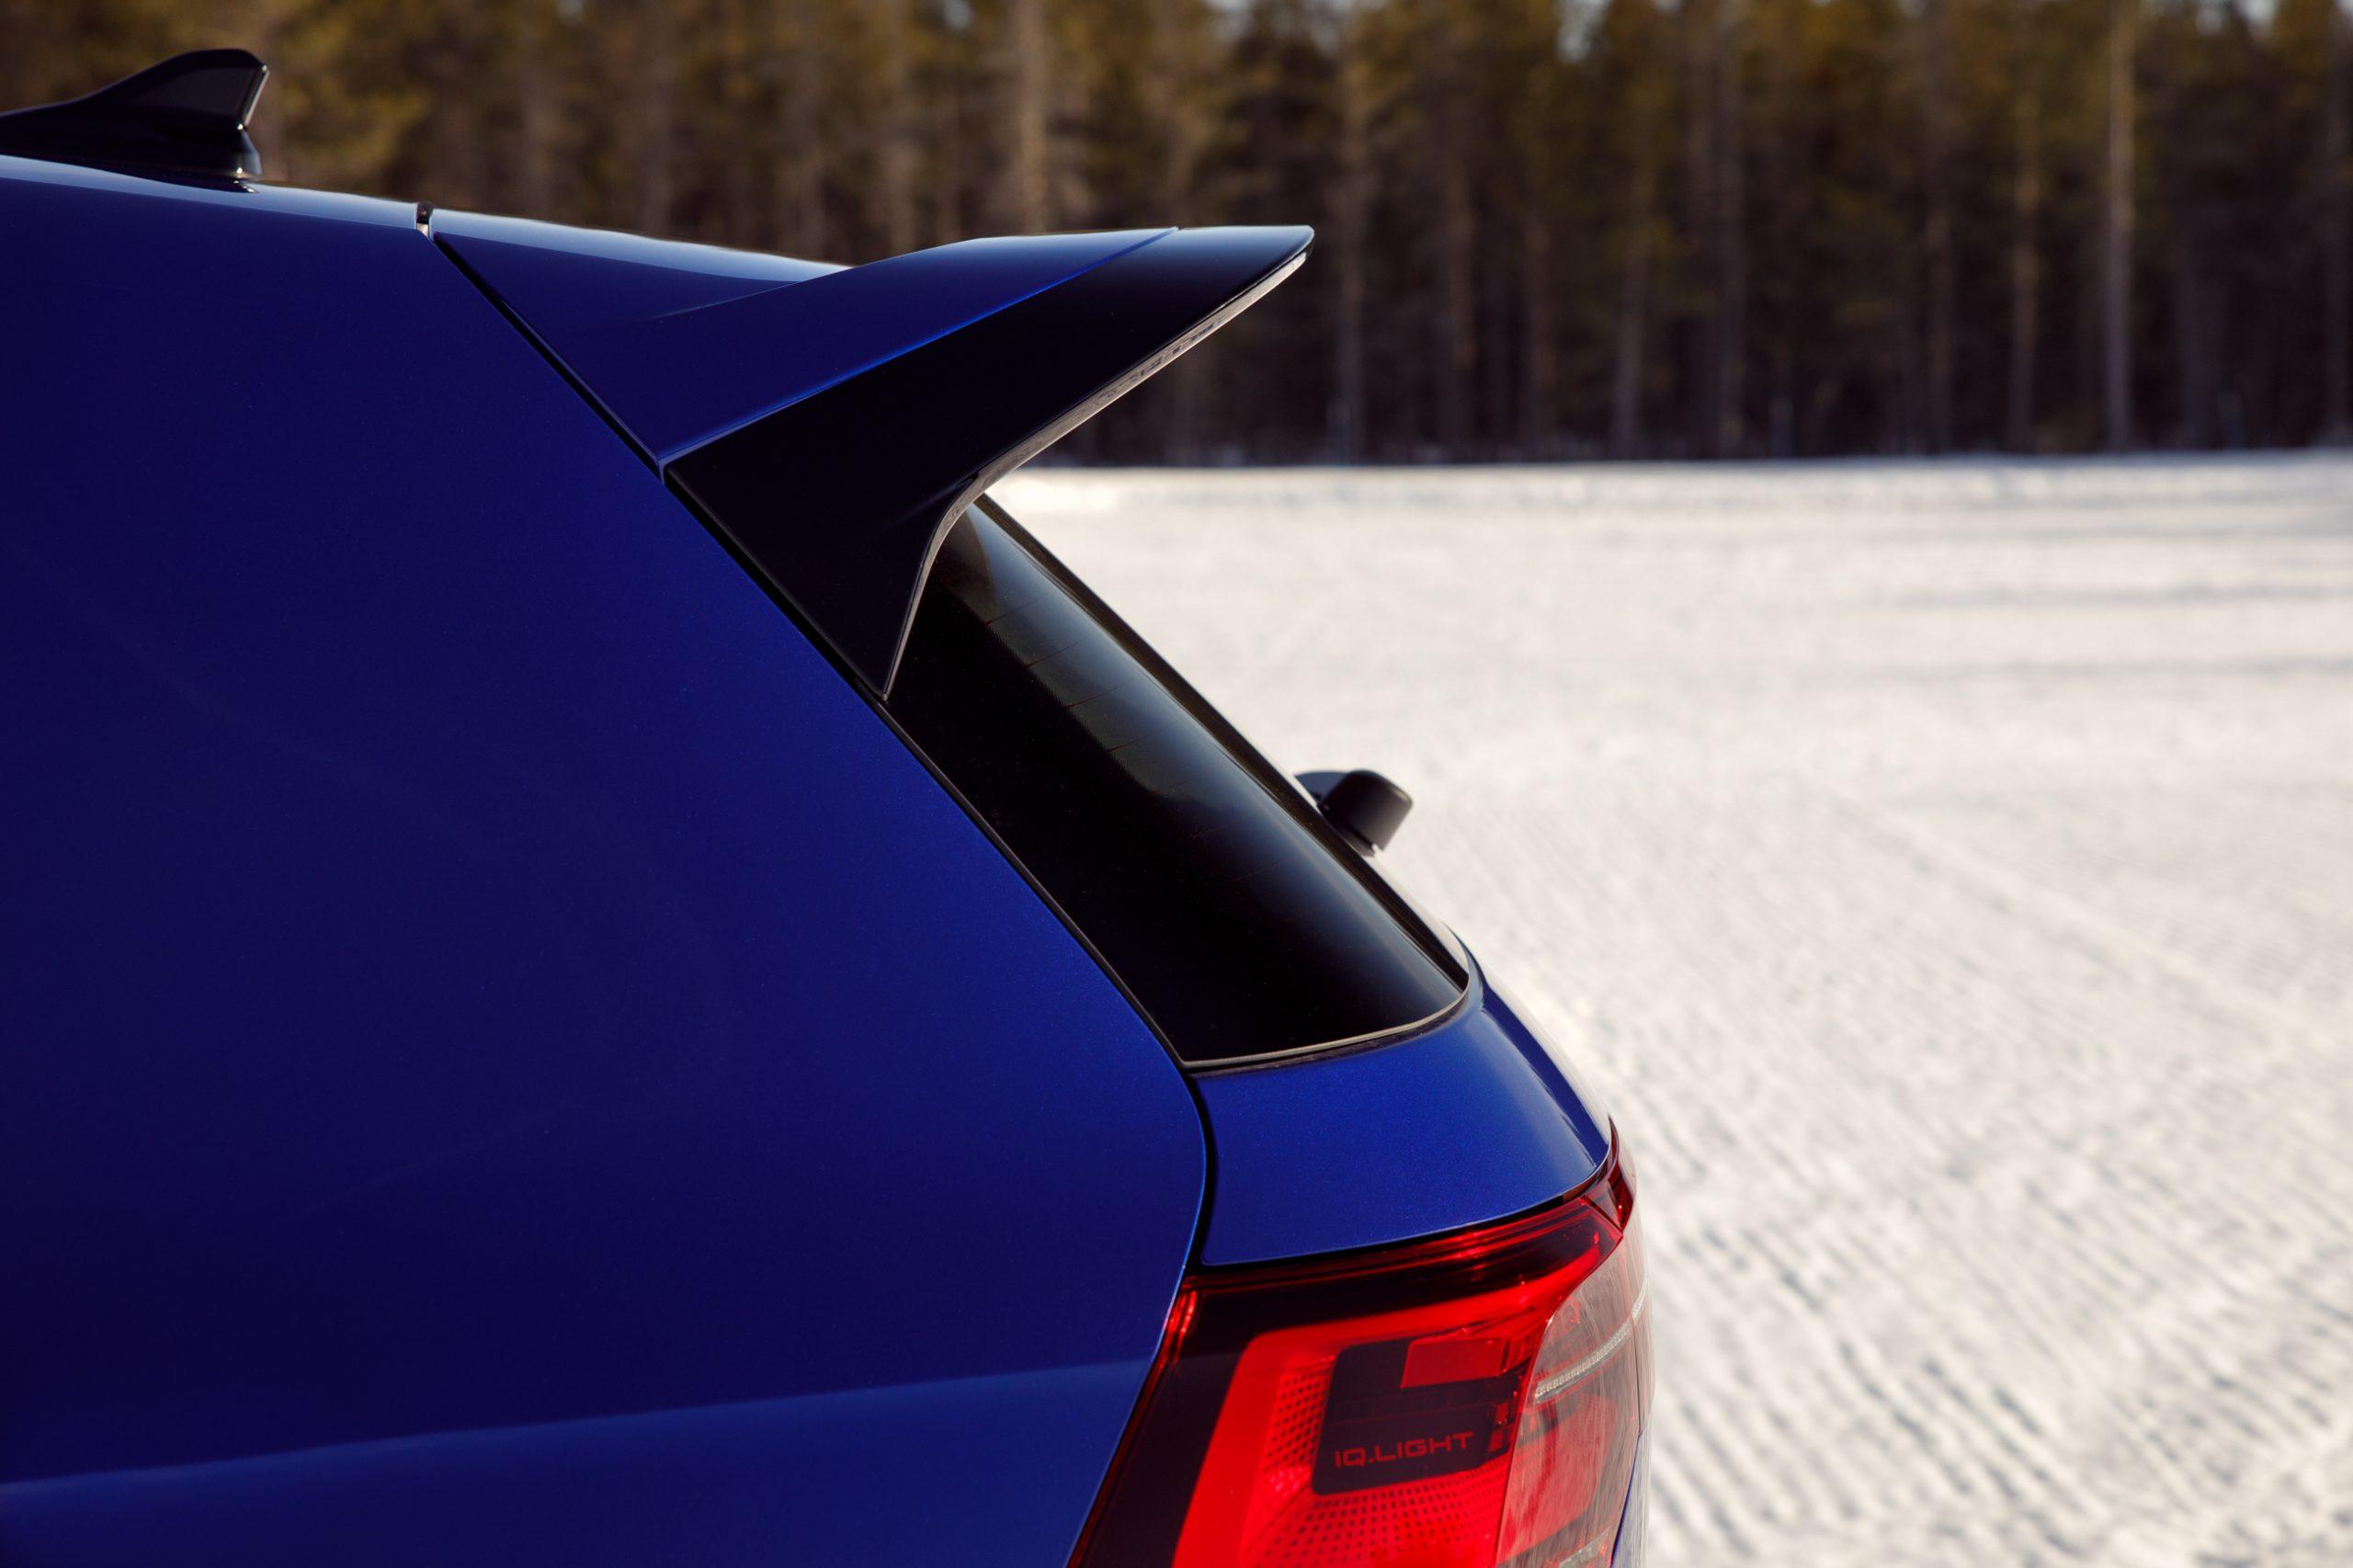 2022 Volkswagen Golf R rear spoiler profile